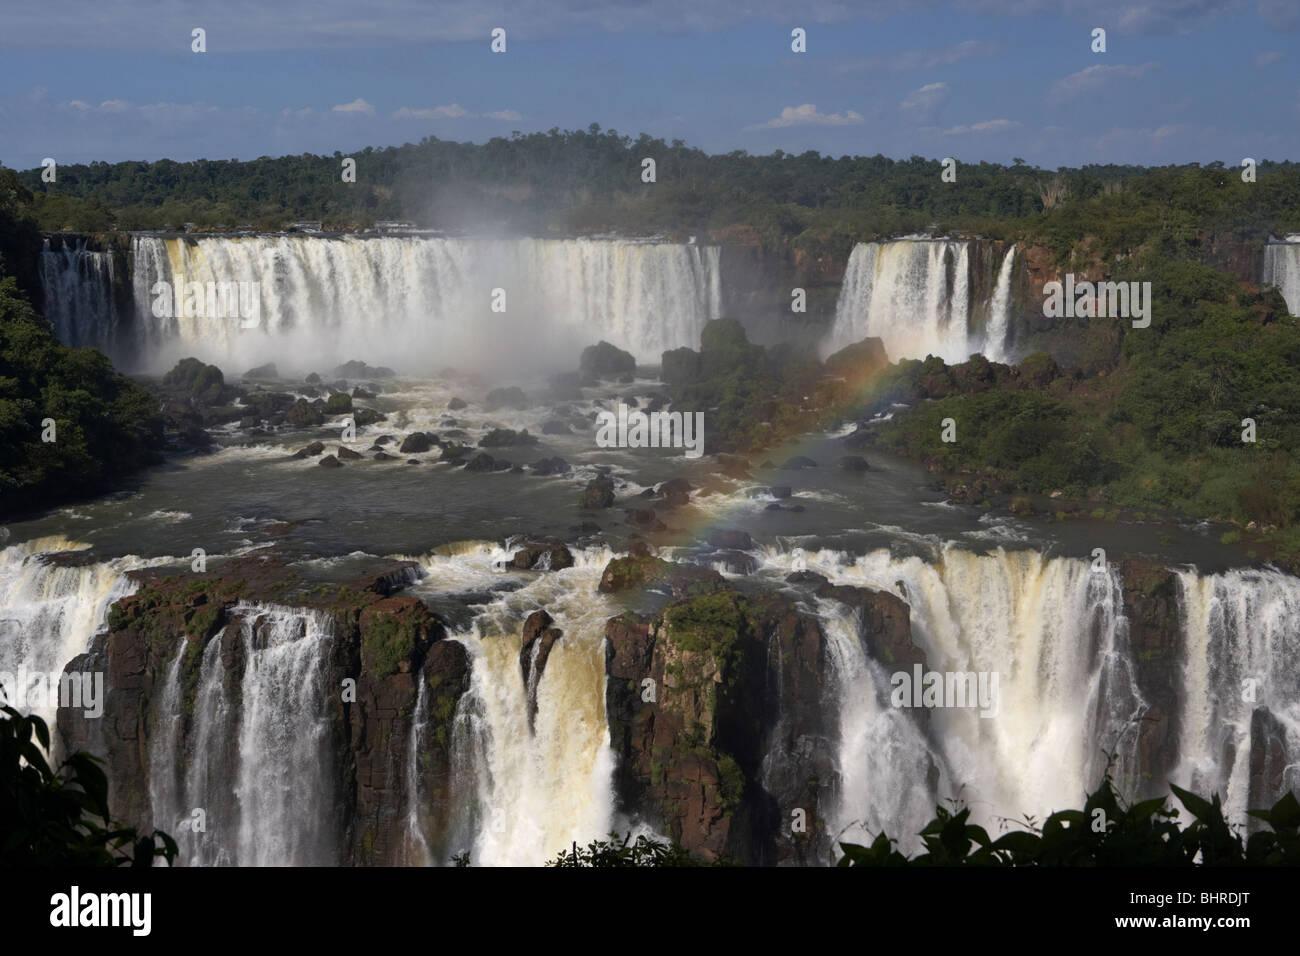 Iguazu falls and san martin island seen from the brazilian side of iguacu national park, parana, brazil, south america - Stock Image